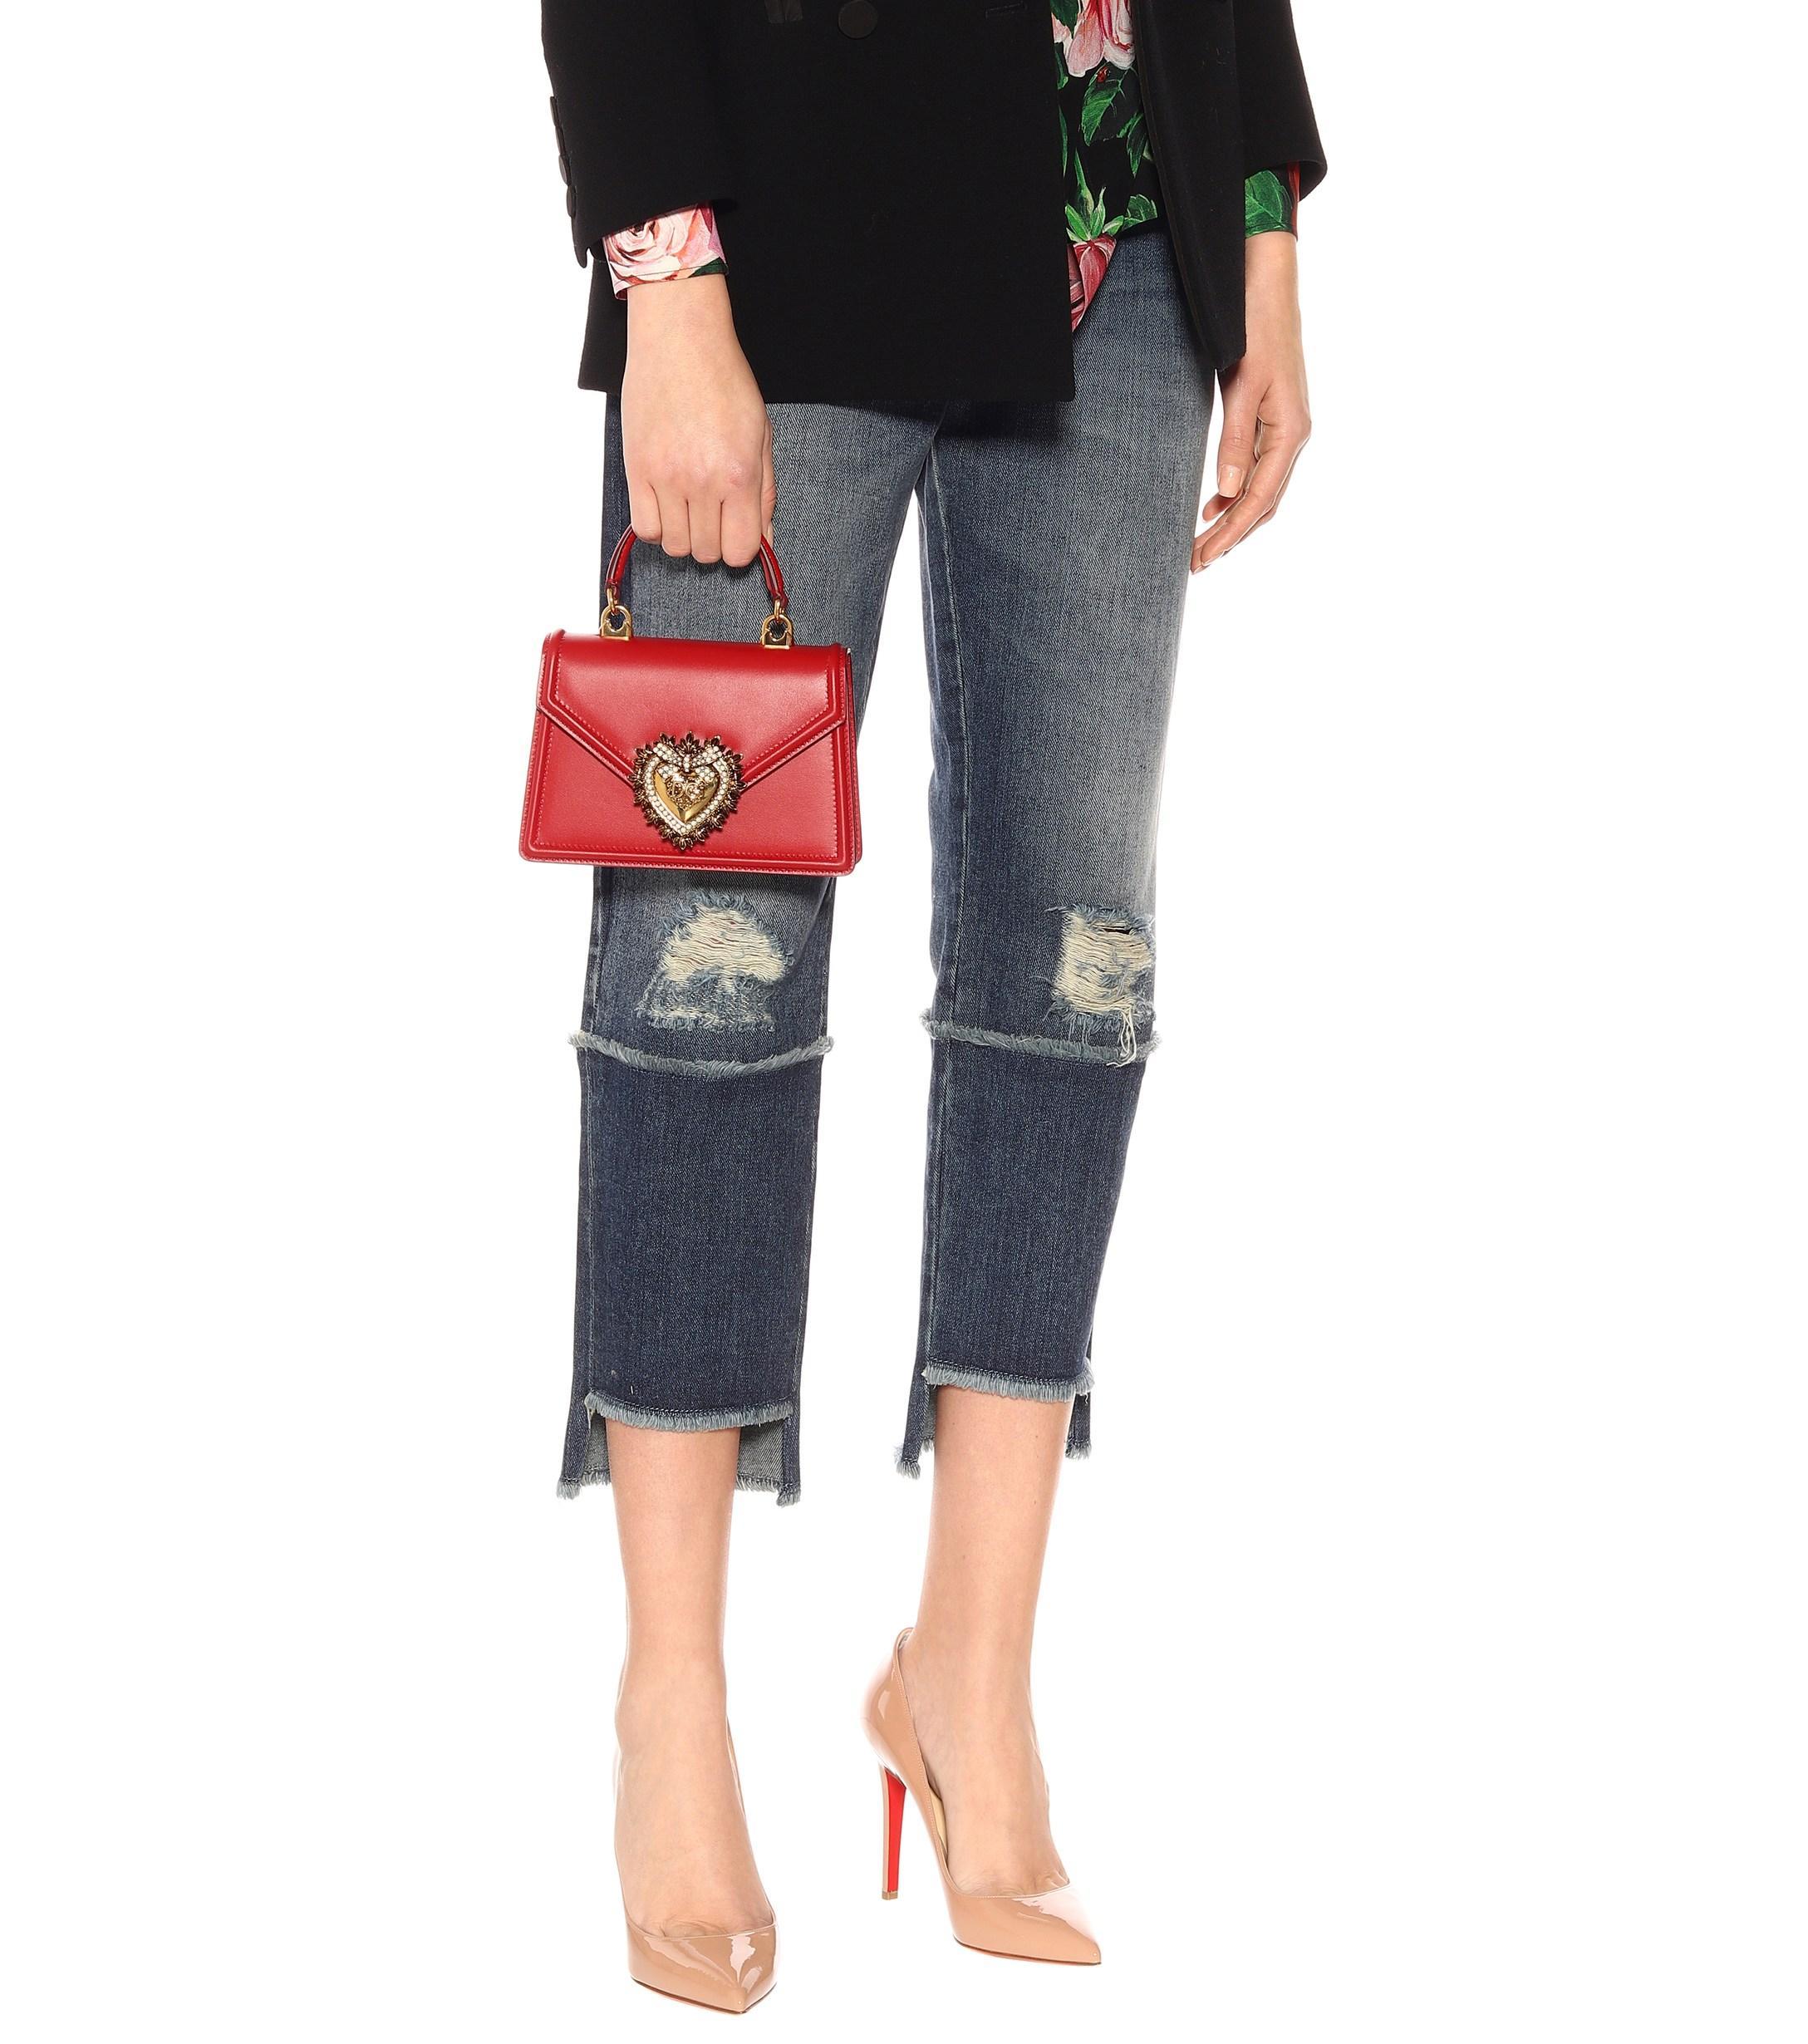 f637da465f3 Dolce & Gabbana Small Devotion Leather Shoulder Bag in Red - Lyst